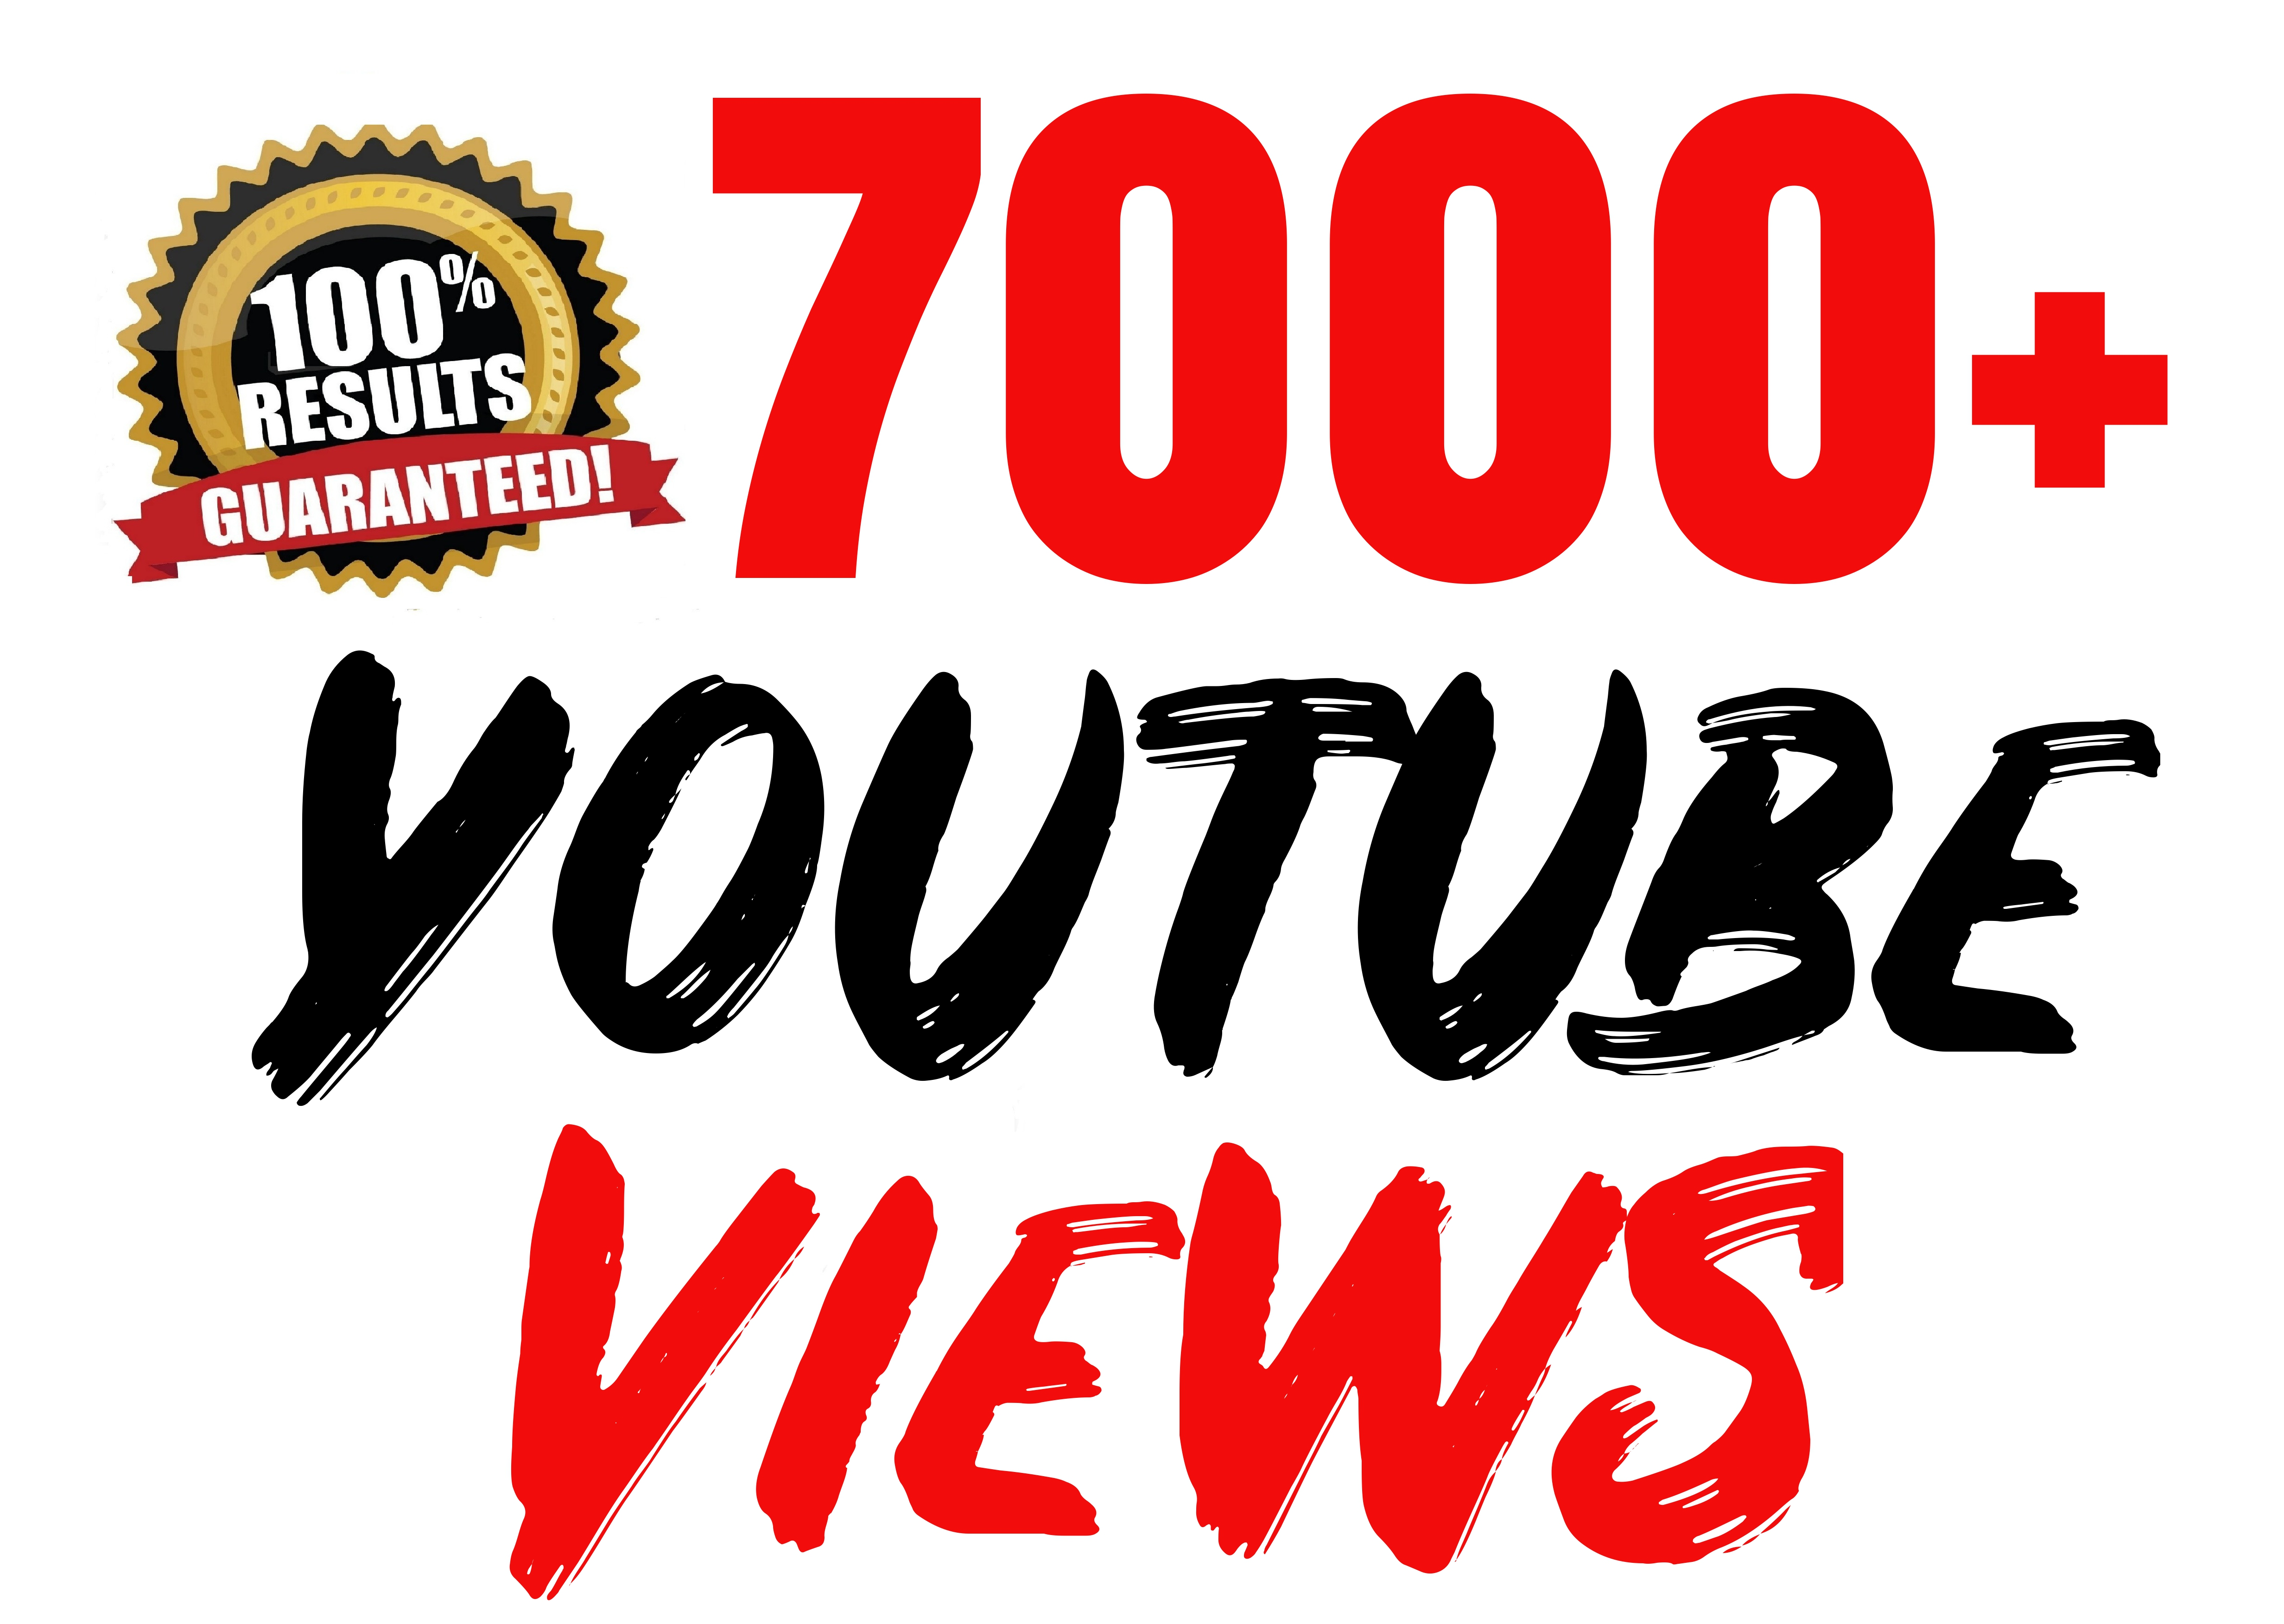 Youtube 7000+ Vieews SEO Optimized Lifetime Guaranteed